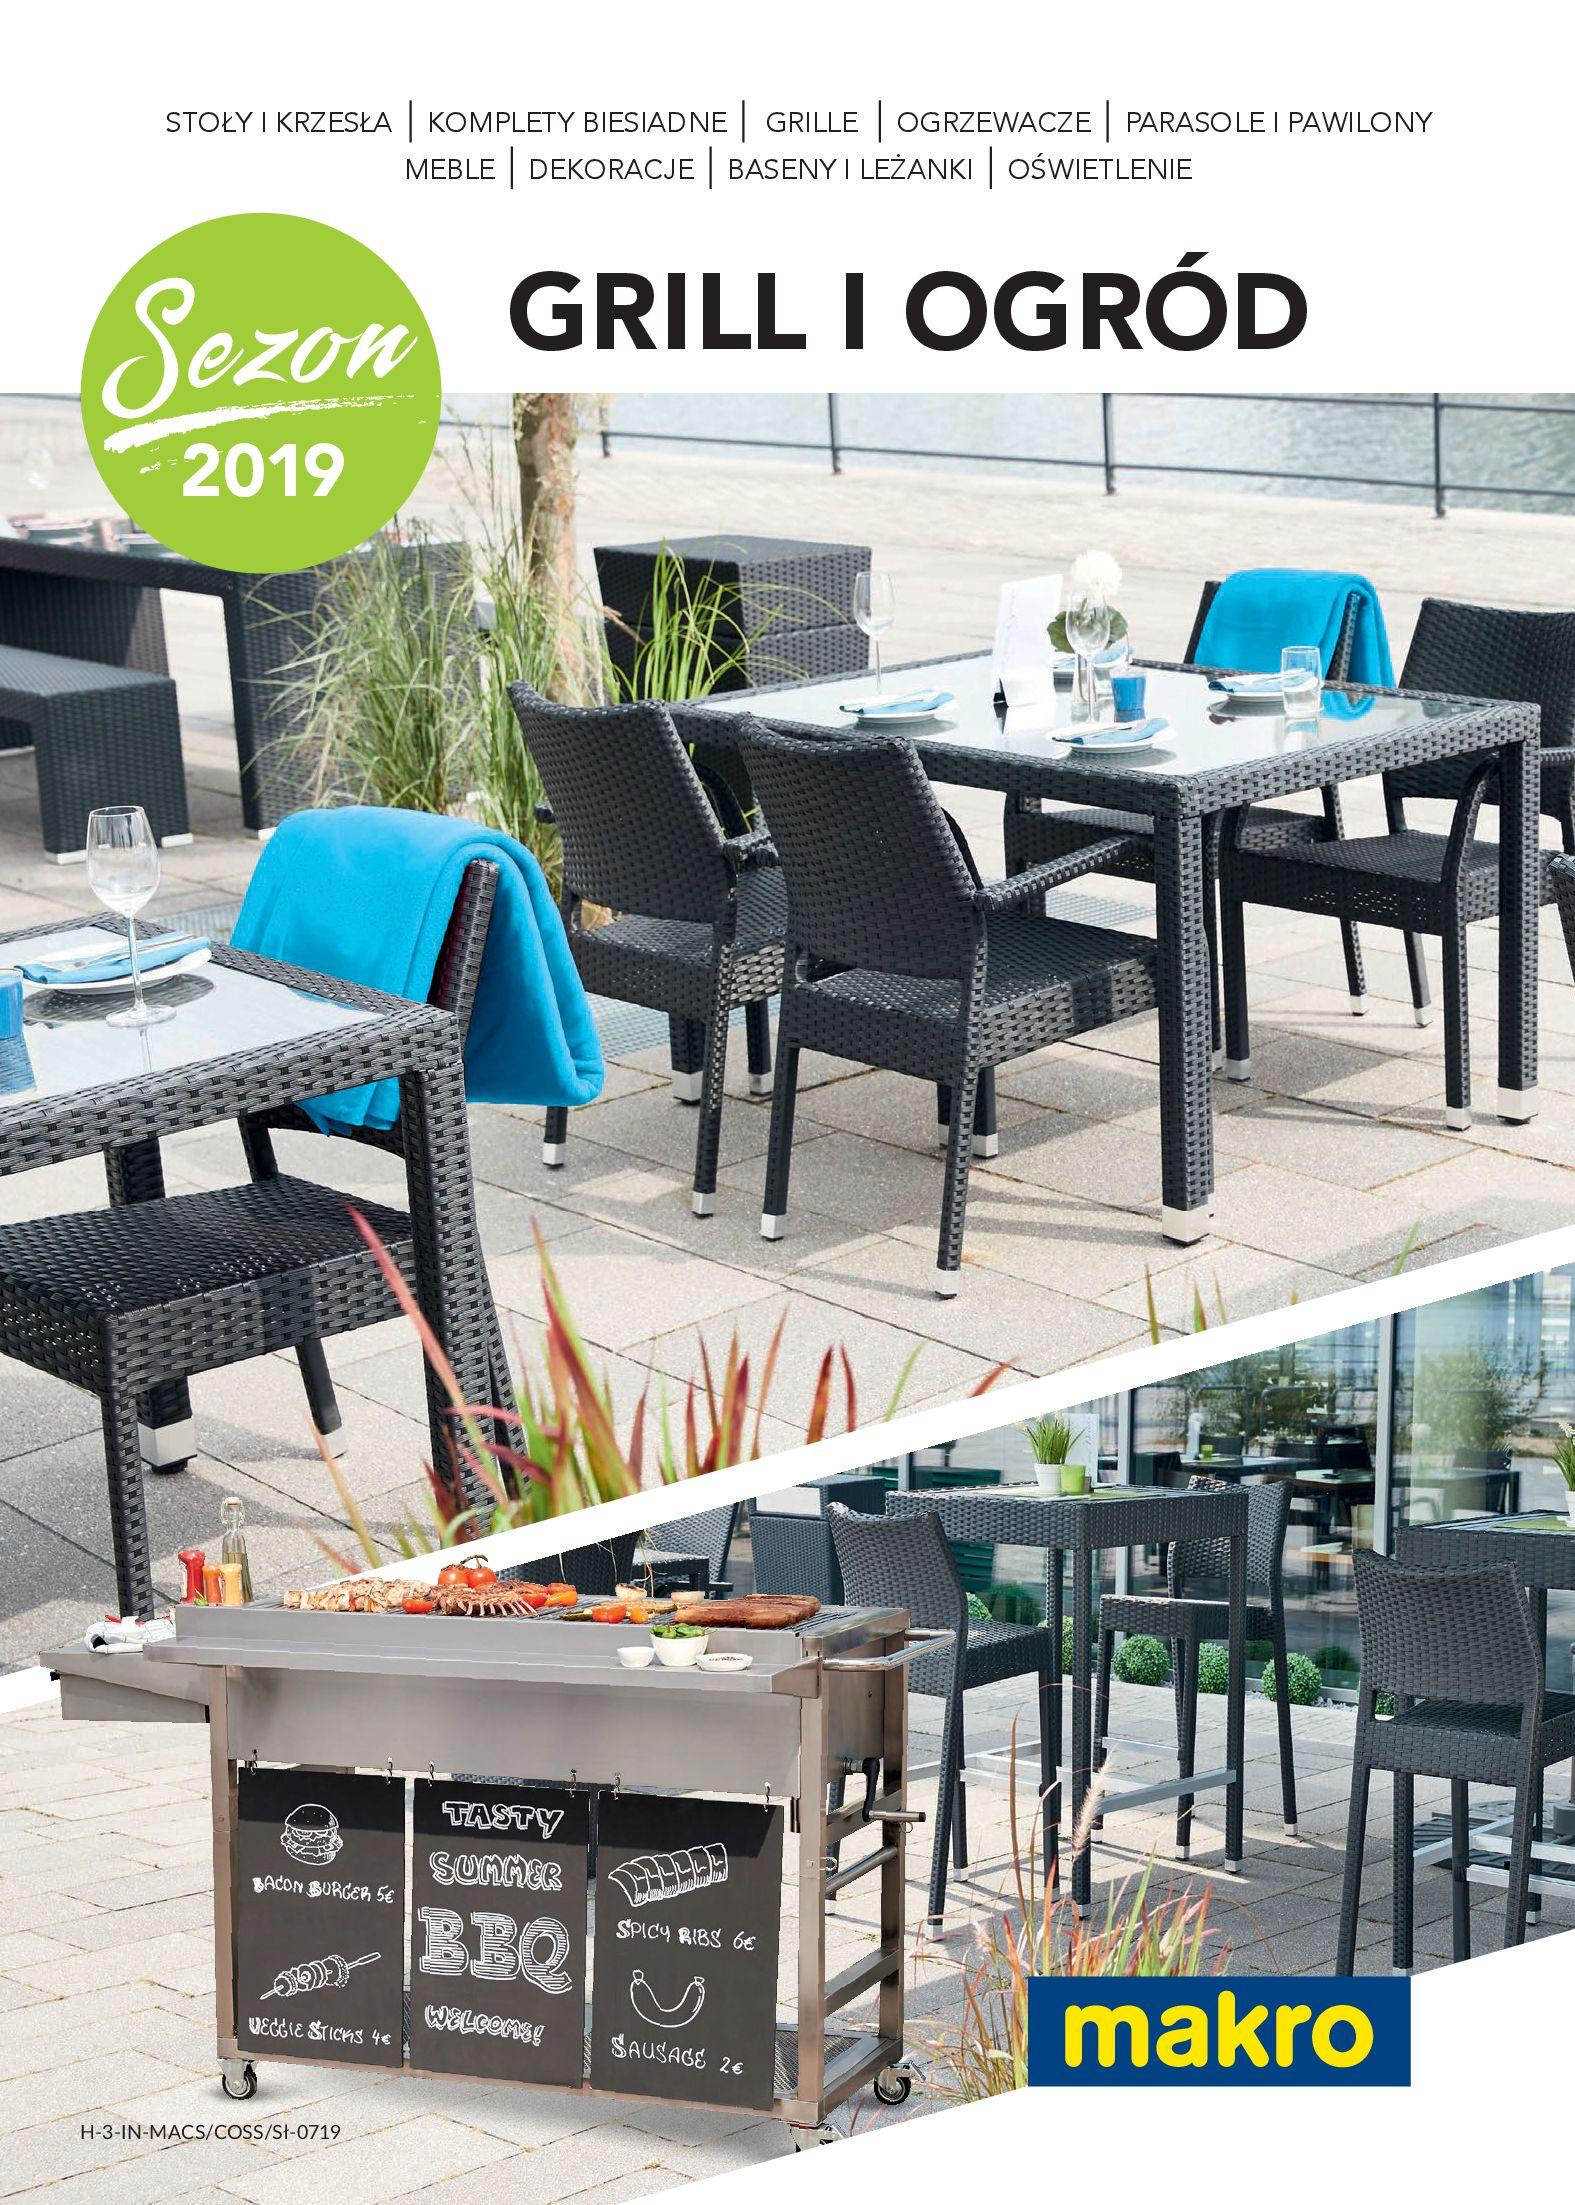 Gazetka Makro - Grill i Ogród-10.06.2019-31.08.2019-page-